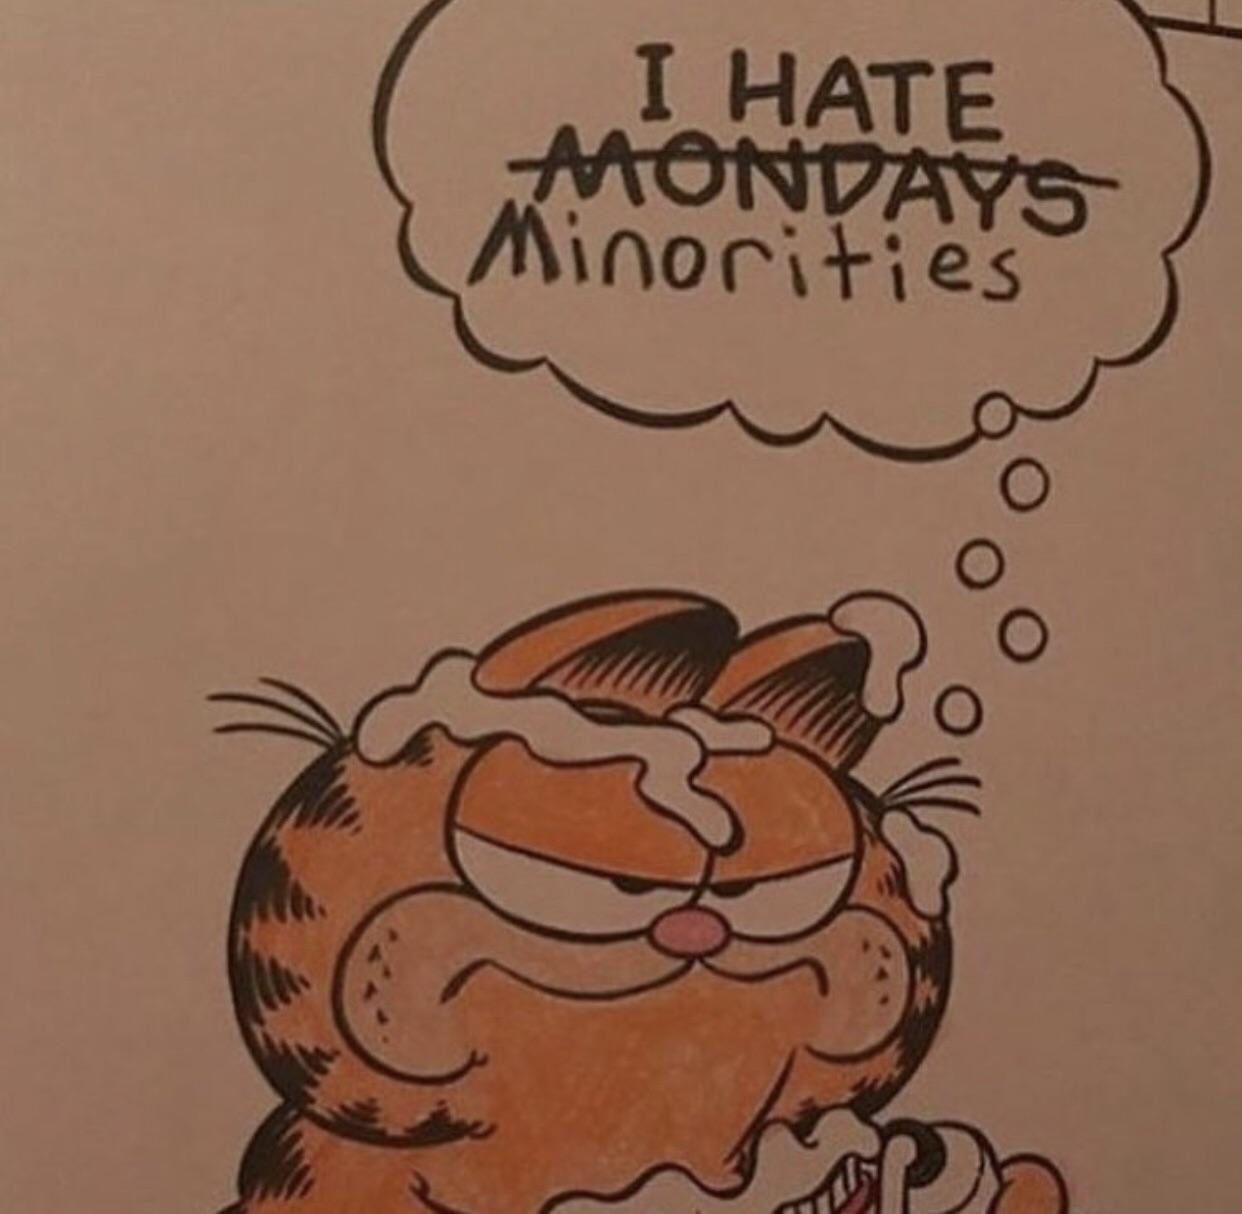 Garfield gamer confirmed - meme